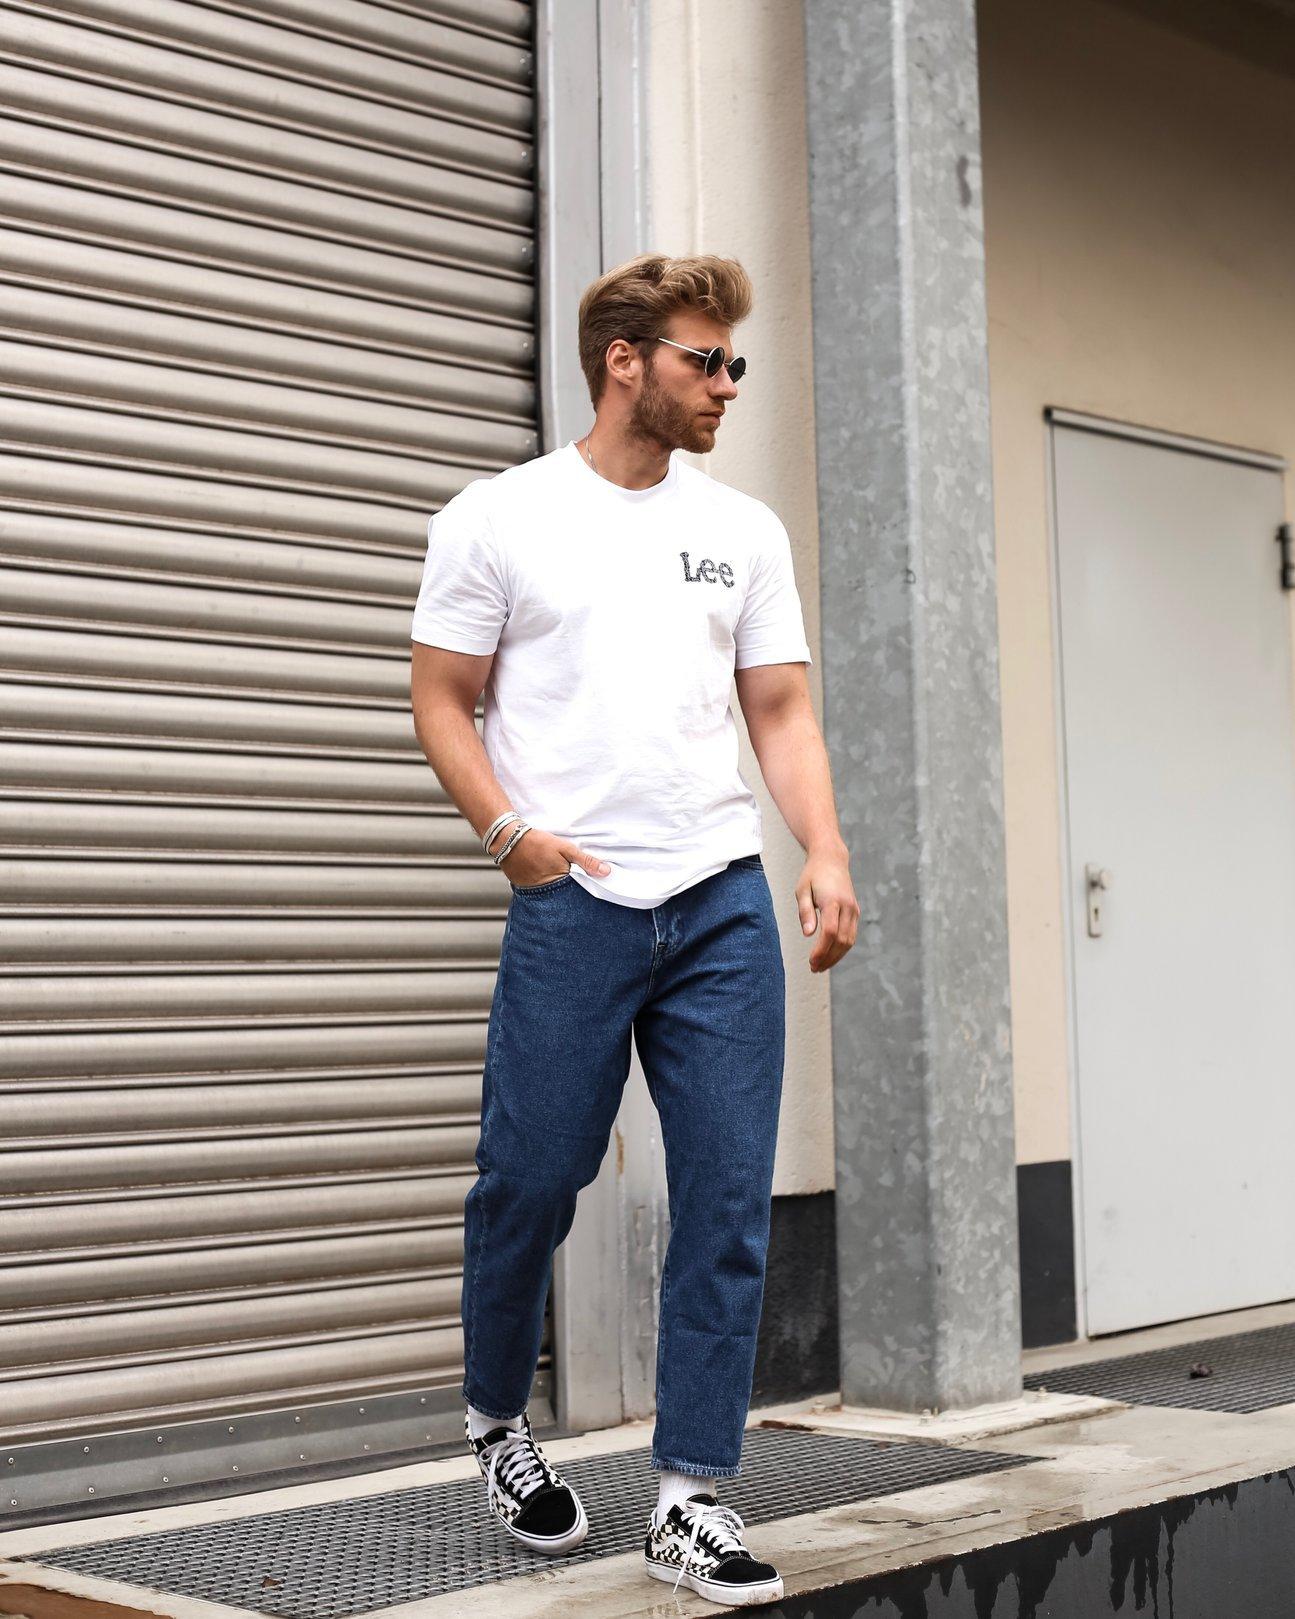 Tshirt ανδρικα με στάμπες | λευκα μπλουζακια | logo tshirts | με τυπωμα